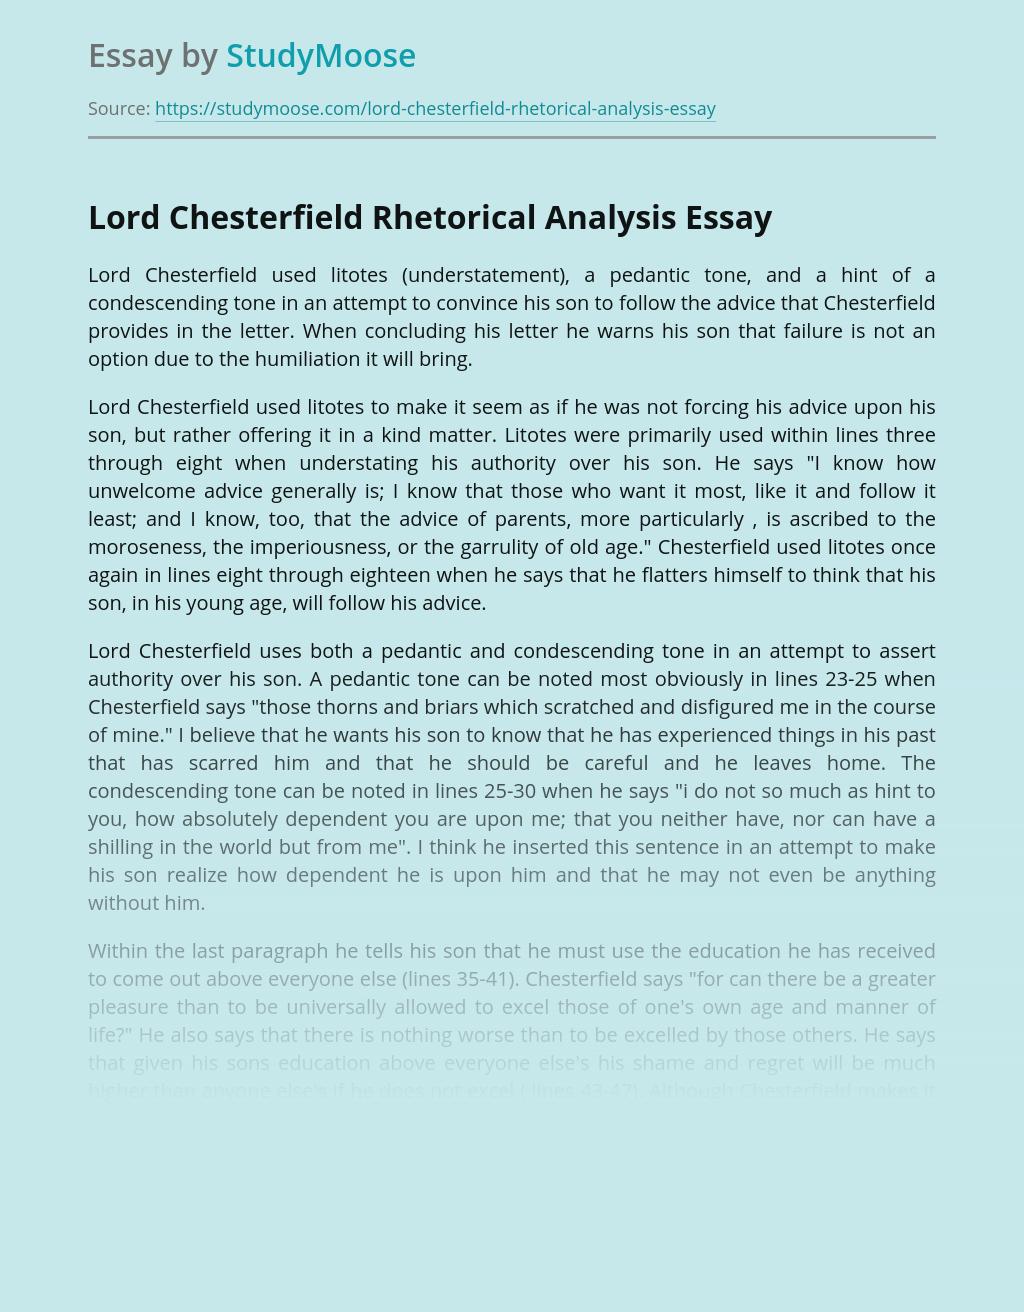 Lord Chesterfield Rhetorical Analysis